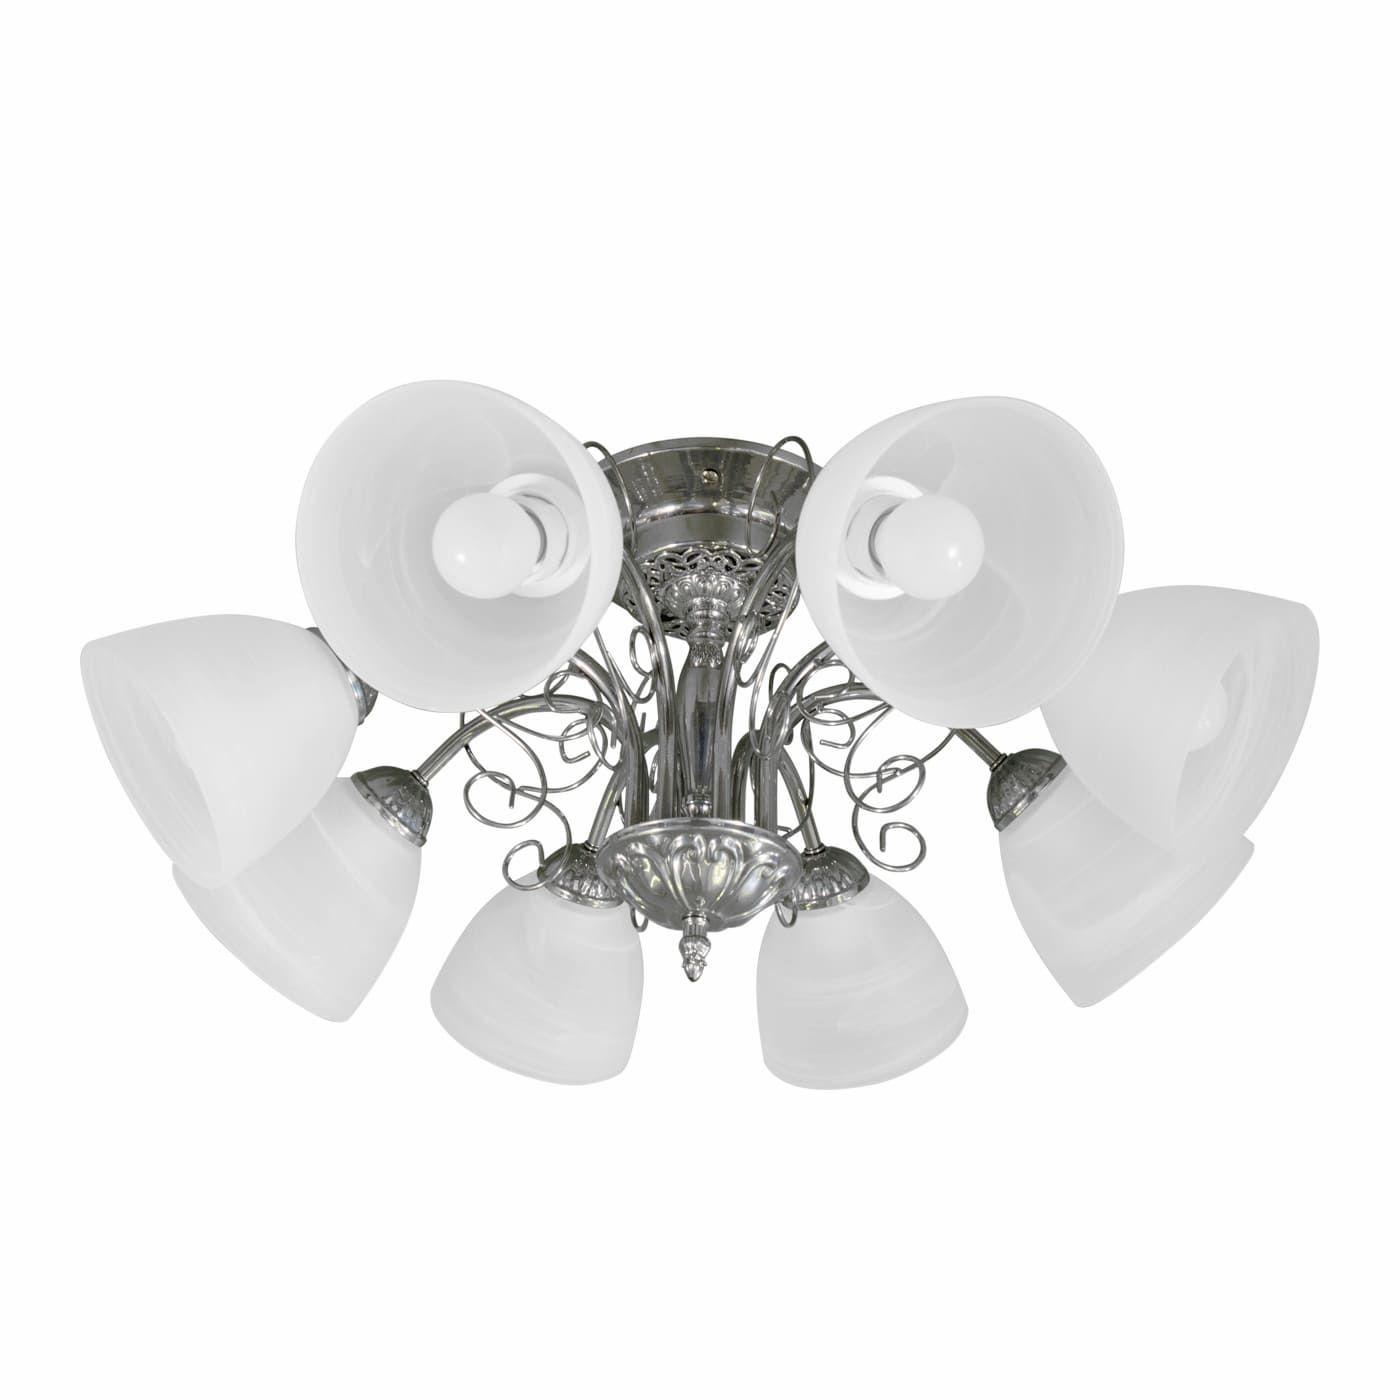 PETRASVET / Ceiling chandelier S2106-8, 8xE27 max. 60W